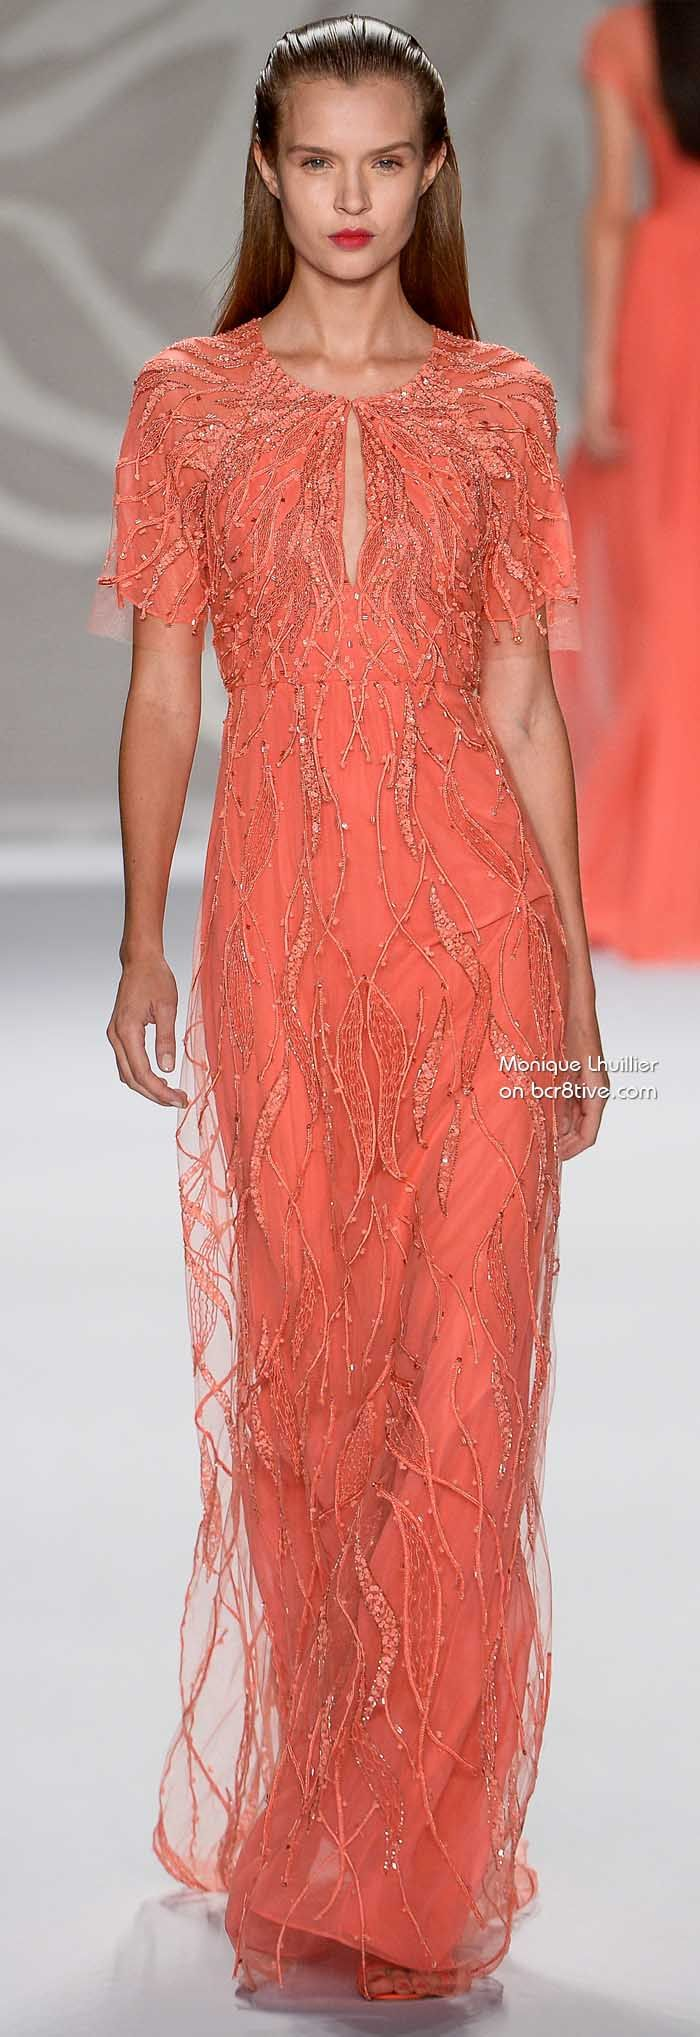 Monique Lhuillier Spring 2014 #NYFW